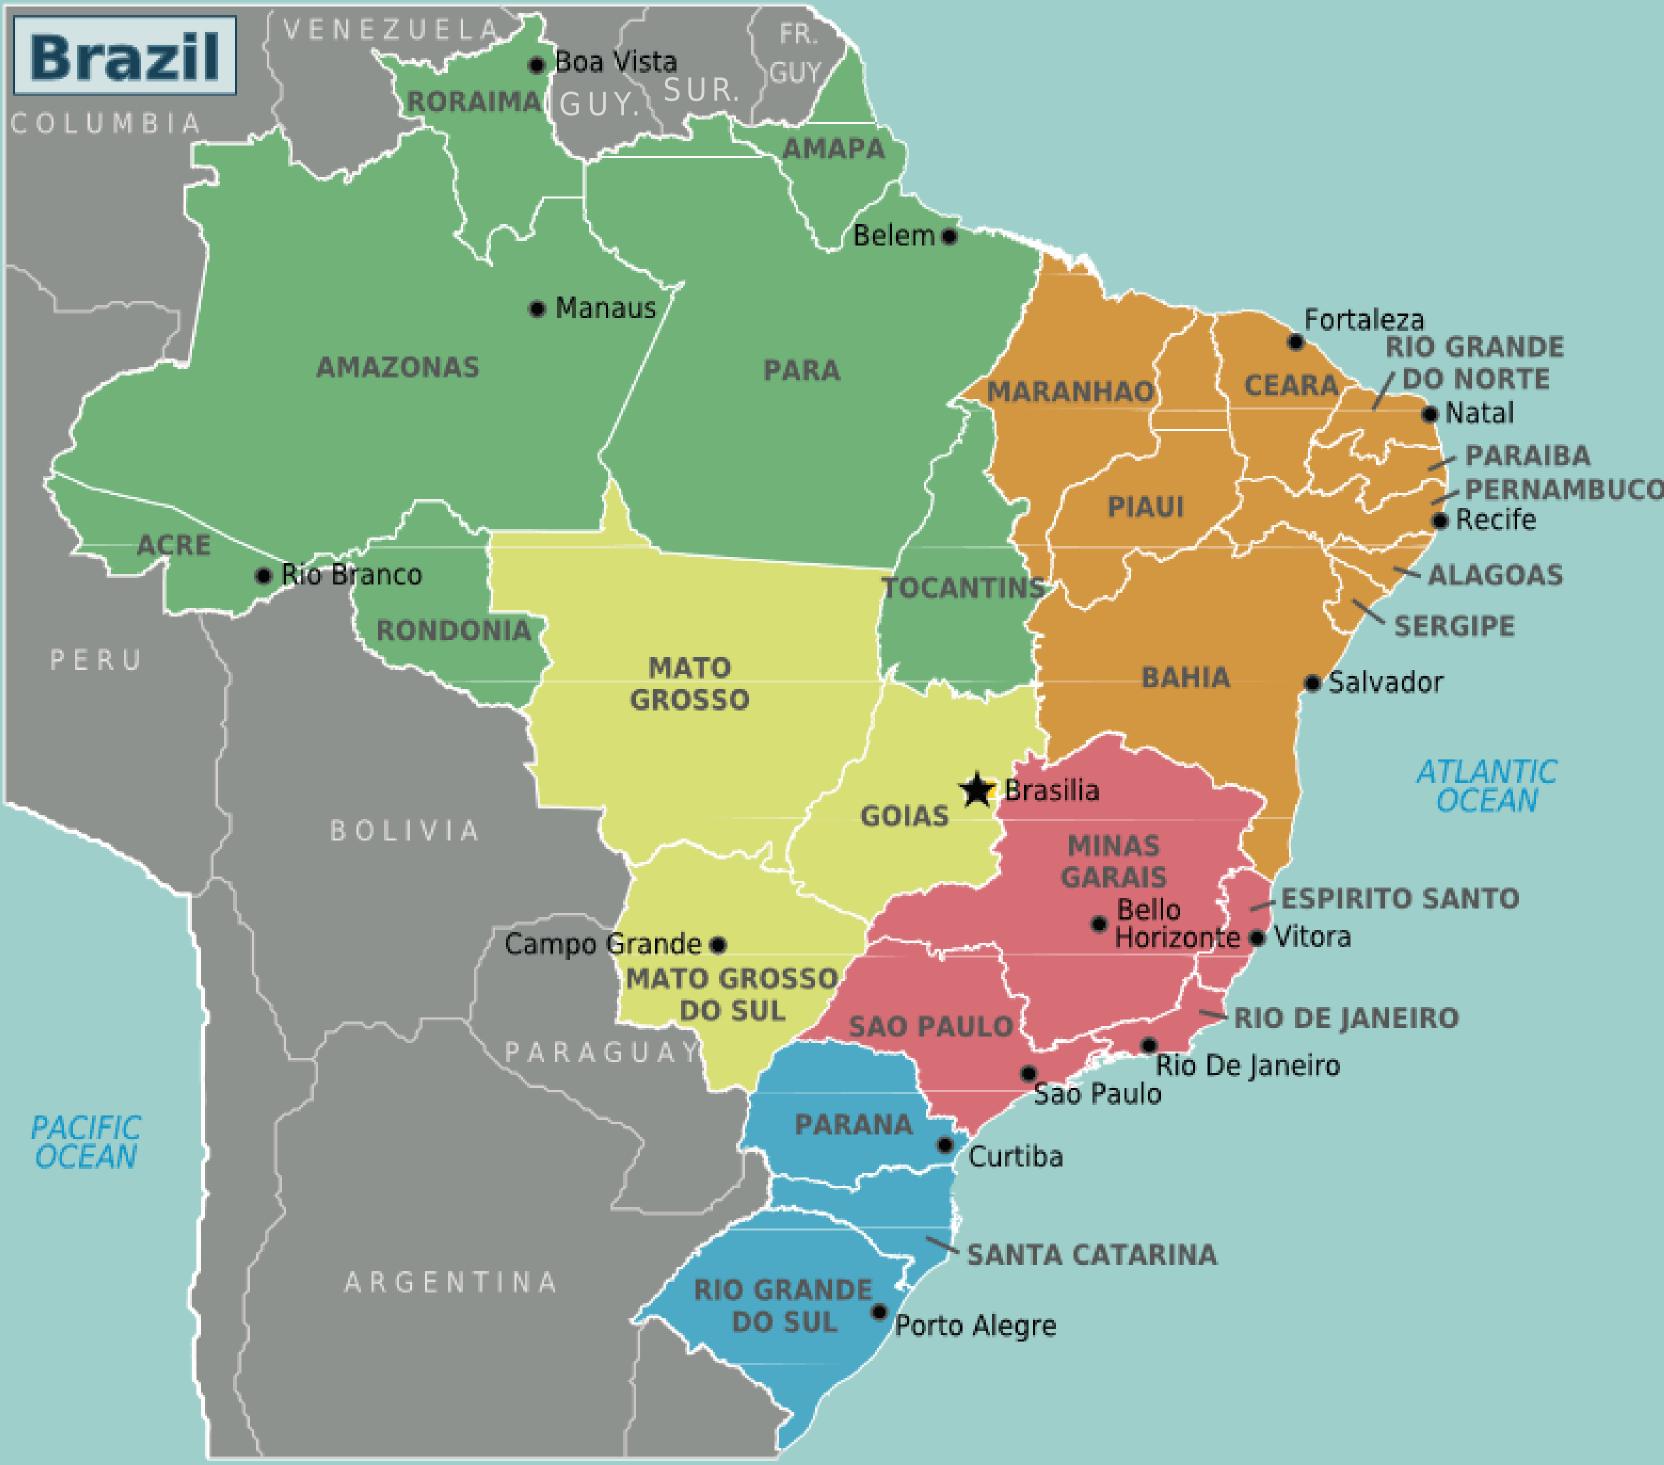 kart over amazonas kart | BrasiLeira | Alt du trenger å vite om Brasil og Amazonas kart over amazonas